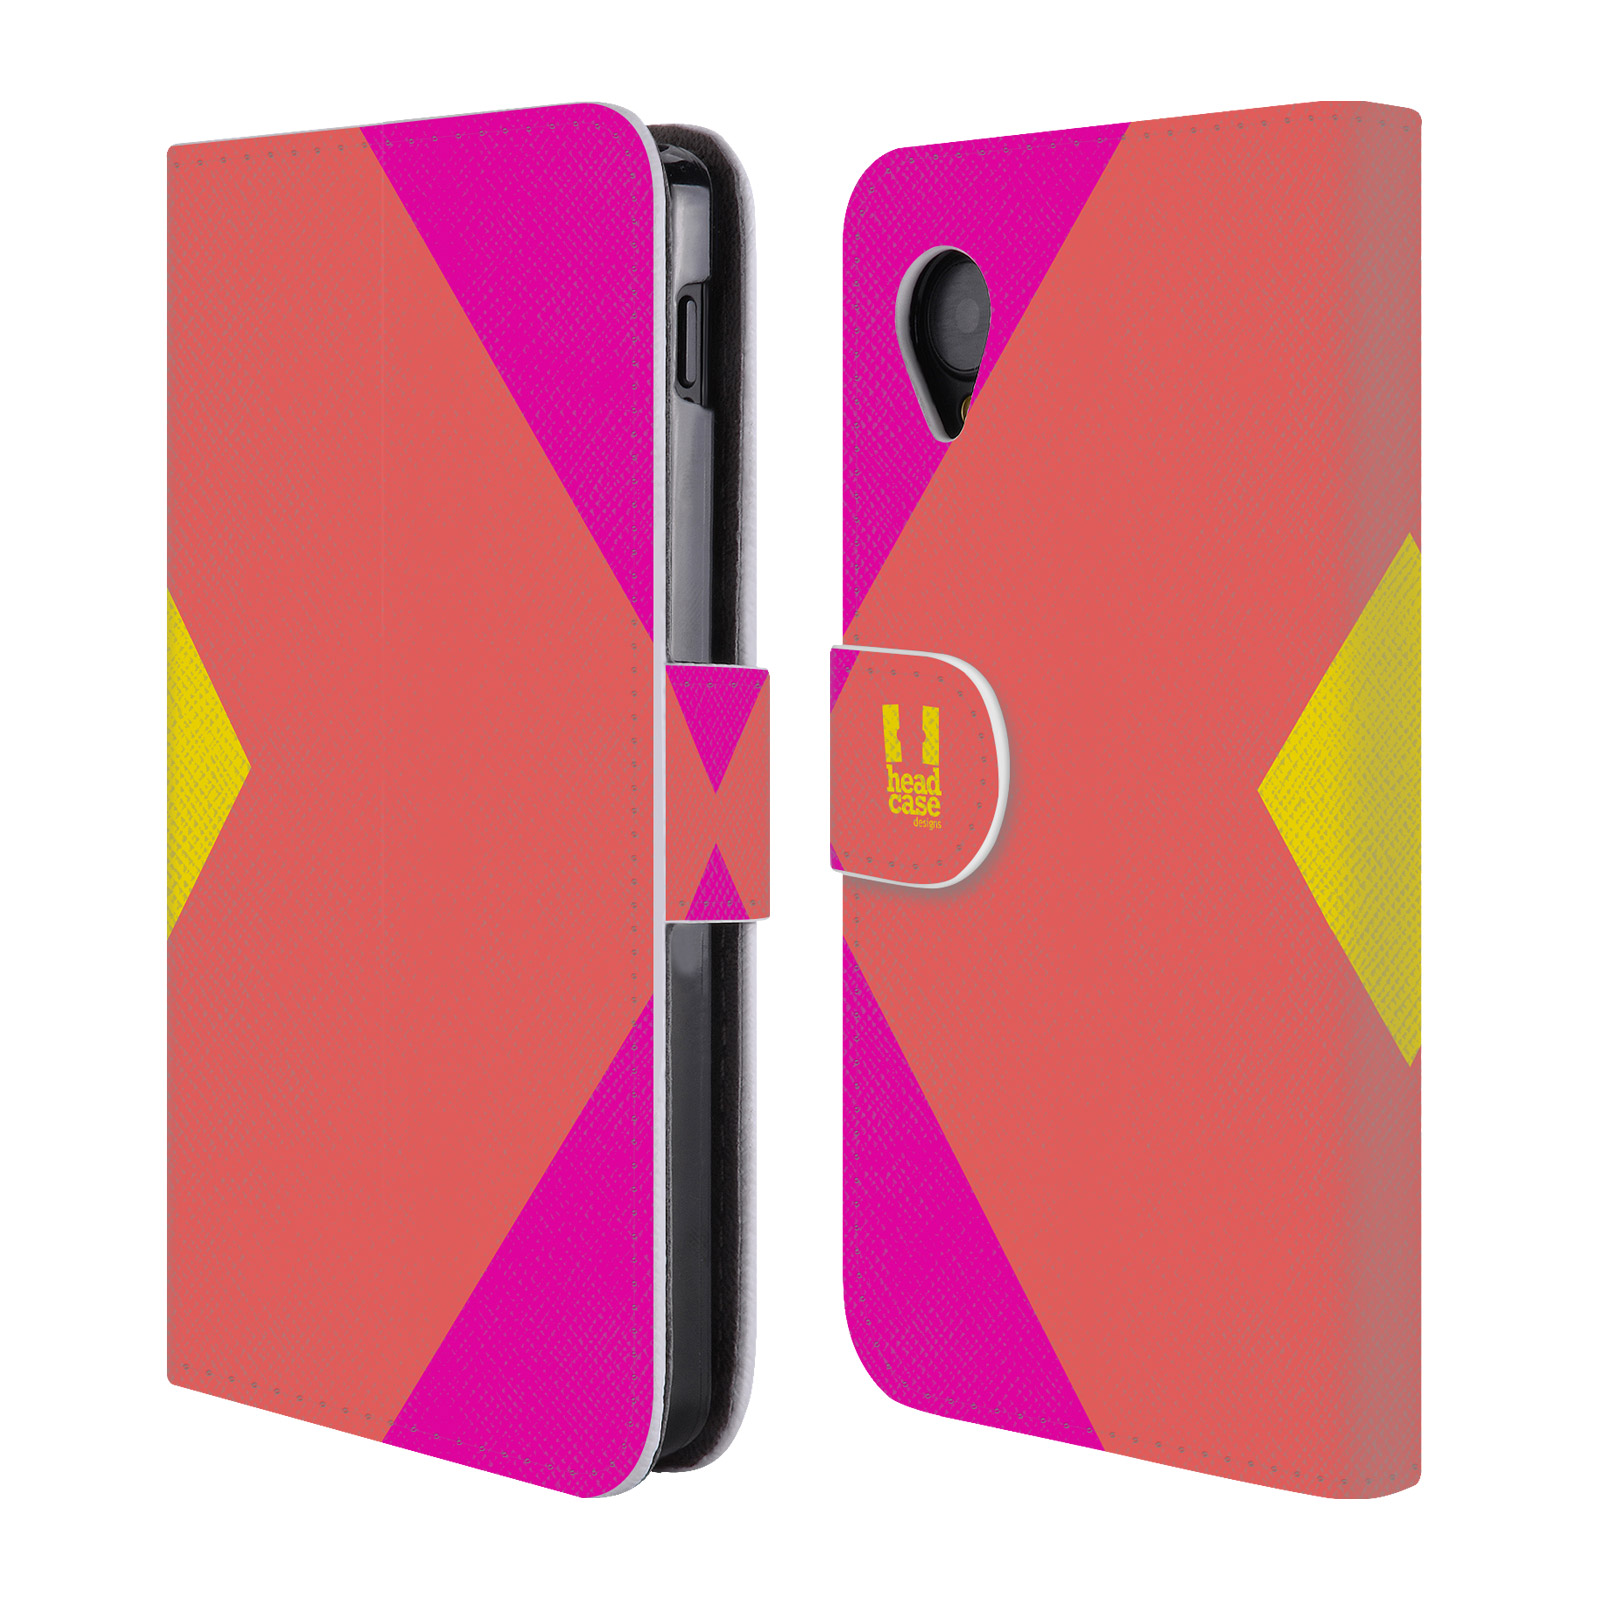 HEAD CASE Flipové pouzdro pro mobil LG GOOGLE NEXUS 5 barevné tvary růžová korál